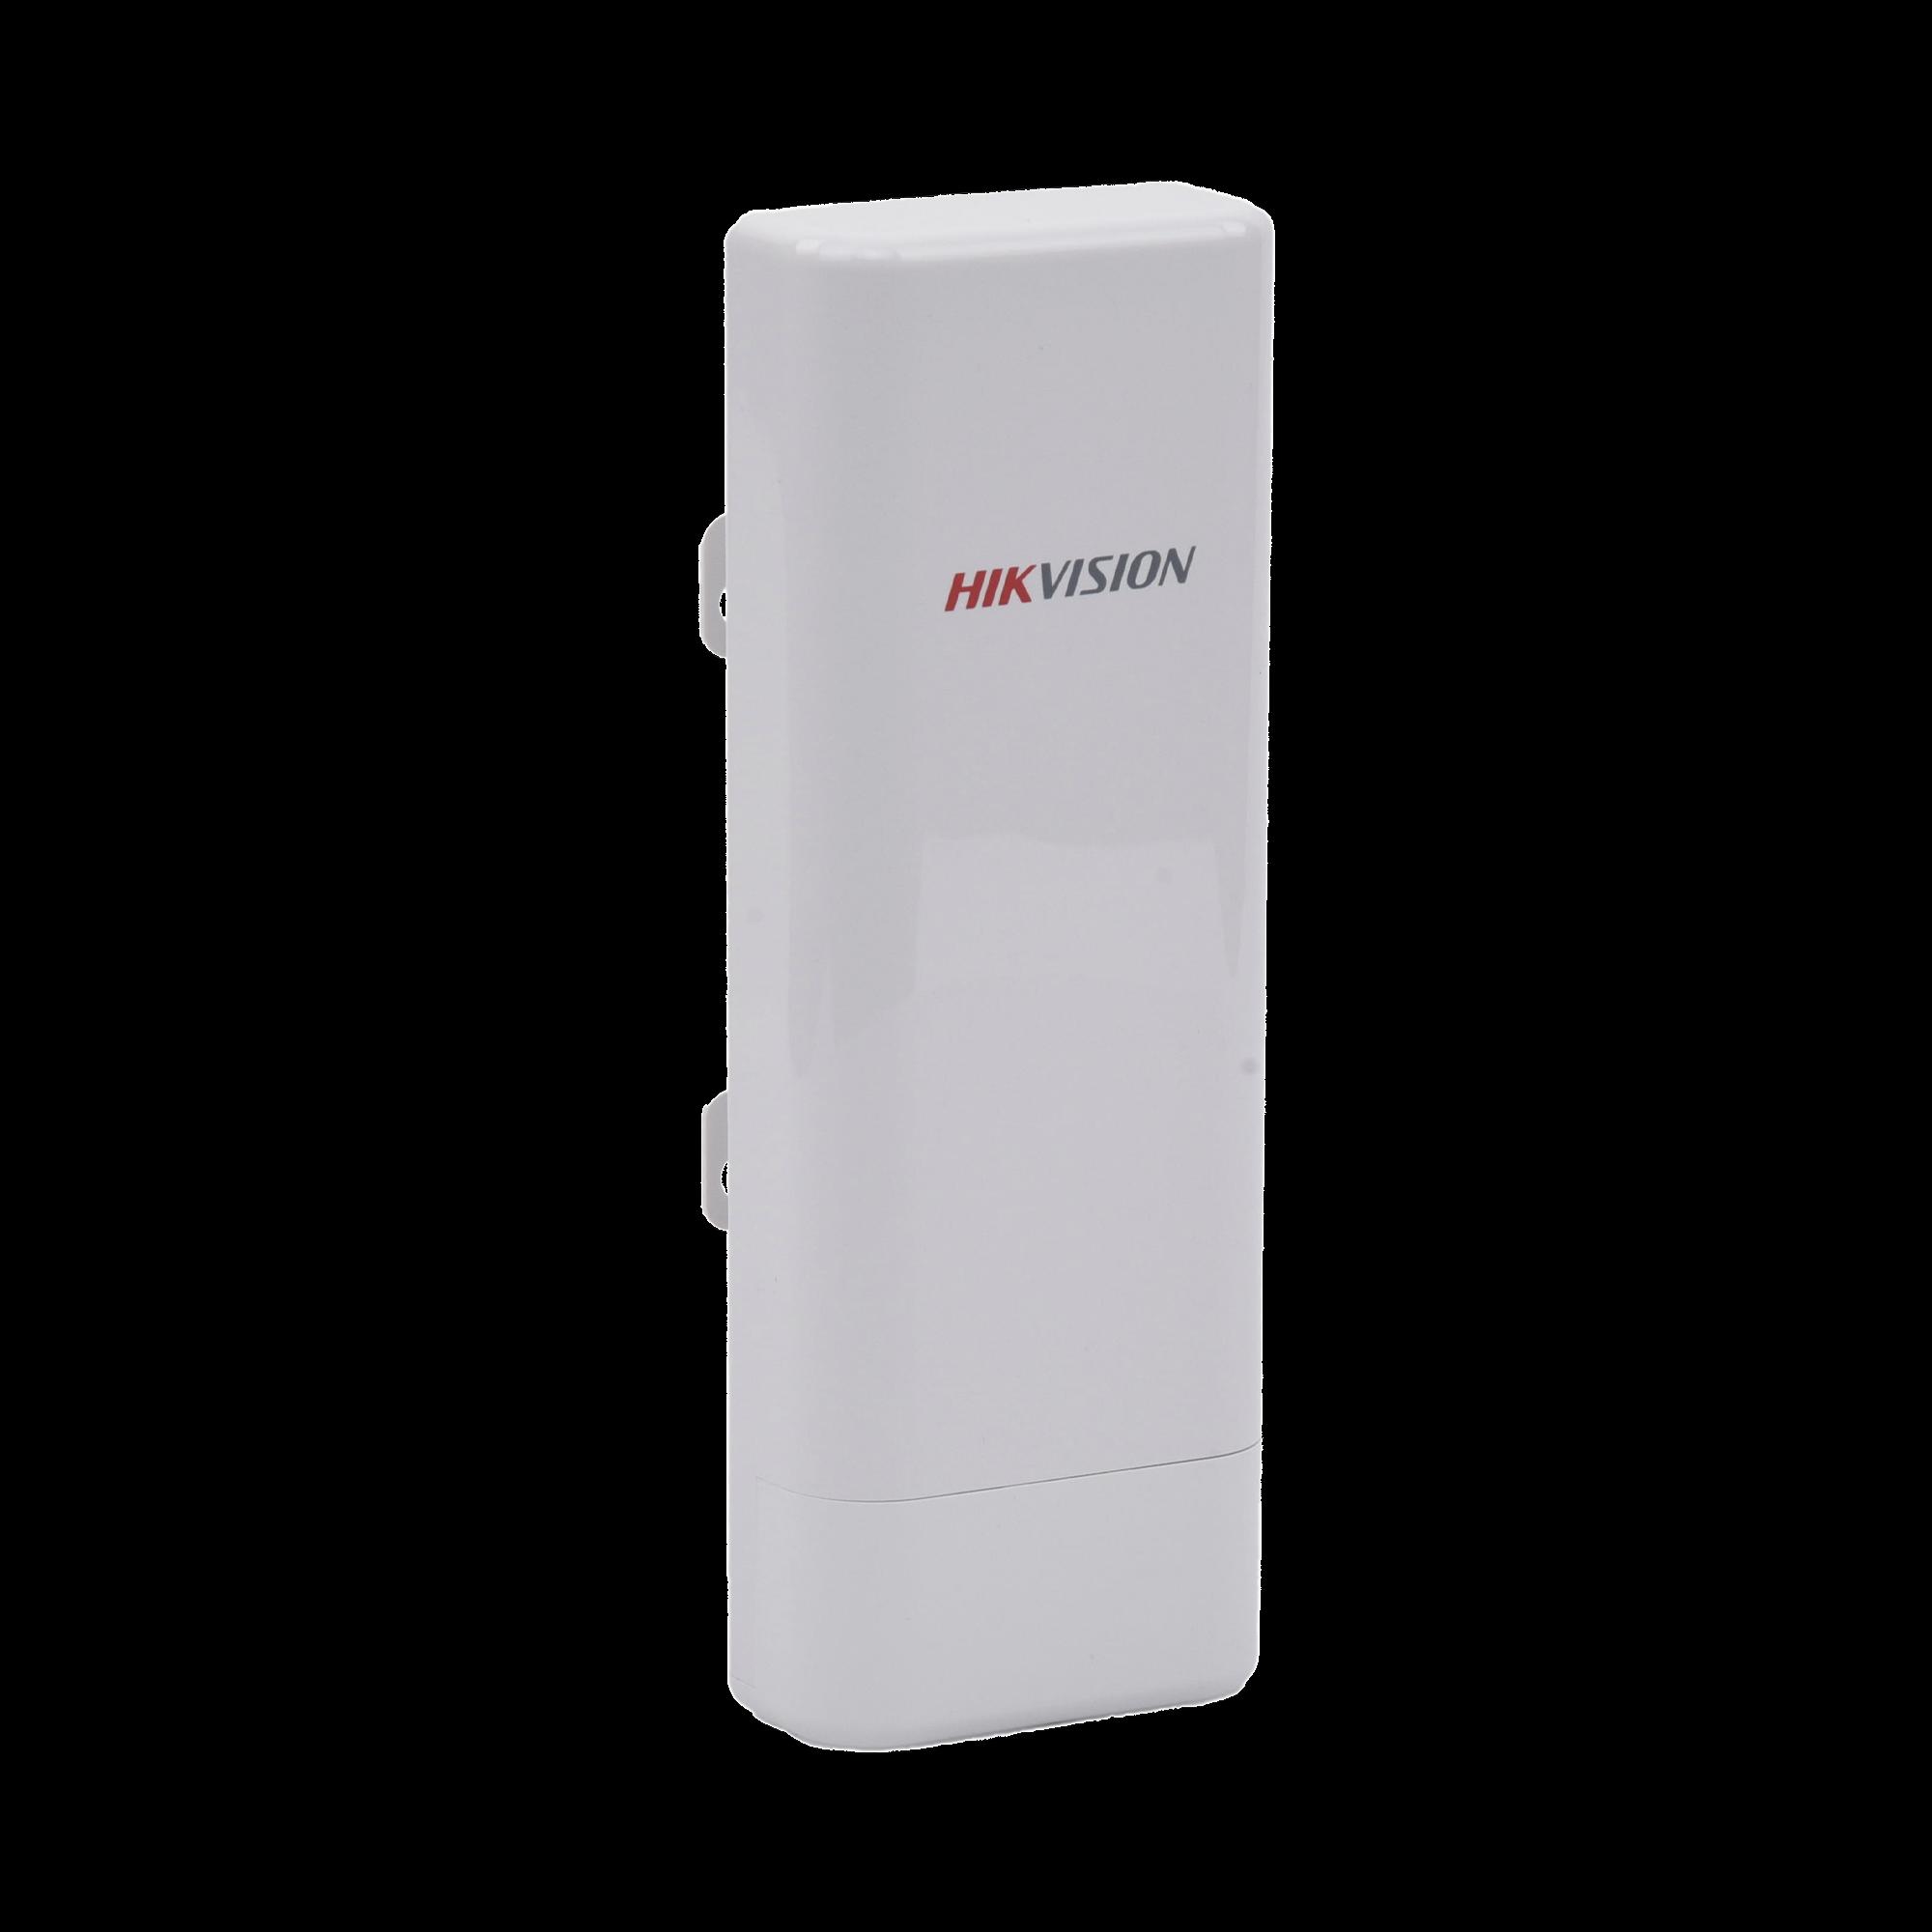 Punto de Acceso PTP y PTMP en 2.4 GHz /  150 Mbps / Antena Integrada de 12 dBi / Angulo de Apertura de 60? H 30? V /  500 mW de Potencia / Exterior IP65